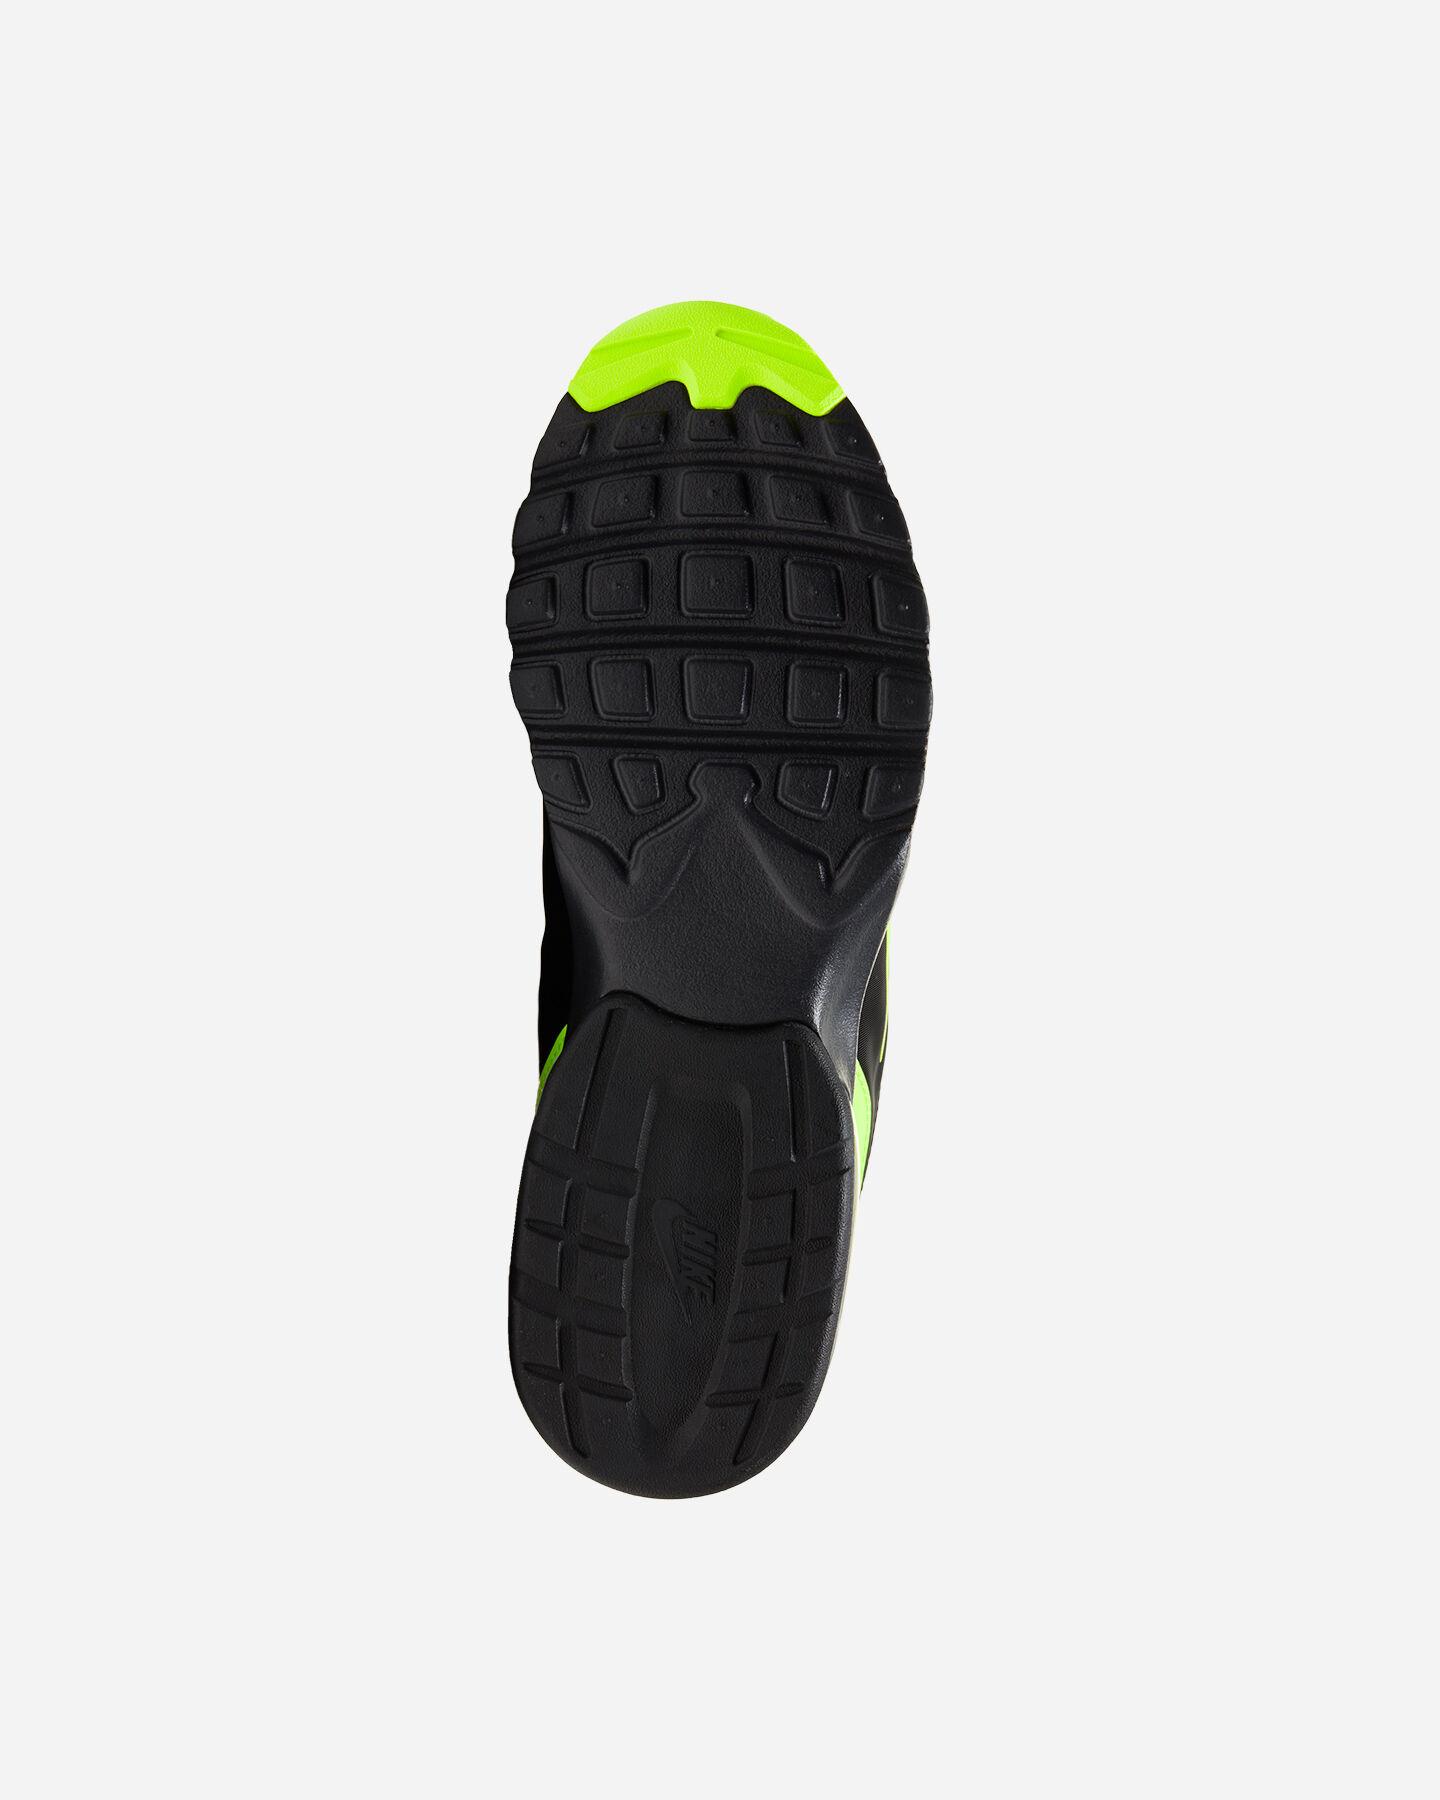 Scarpe sneakers NIKE AIR MAX VG-R M S5247961 scatto 2